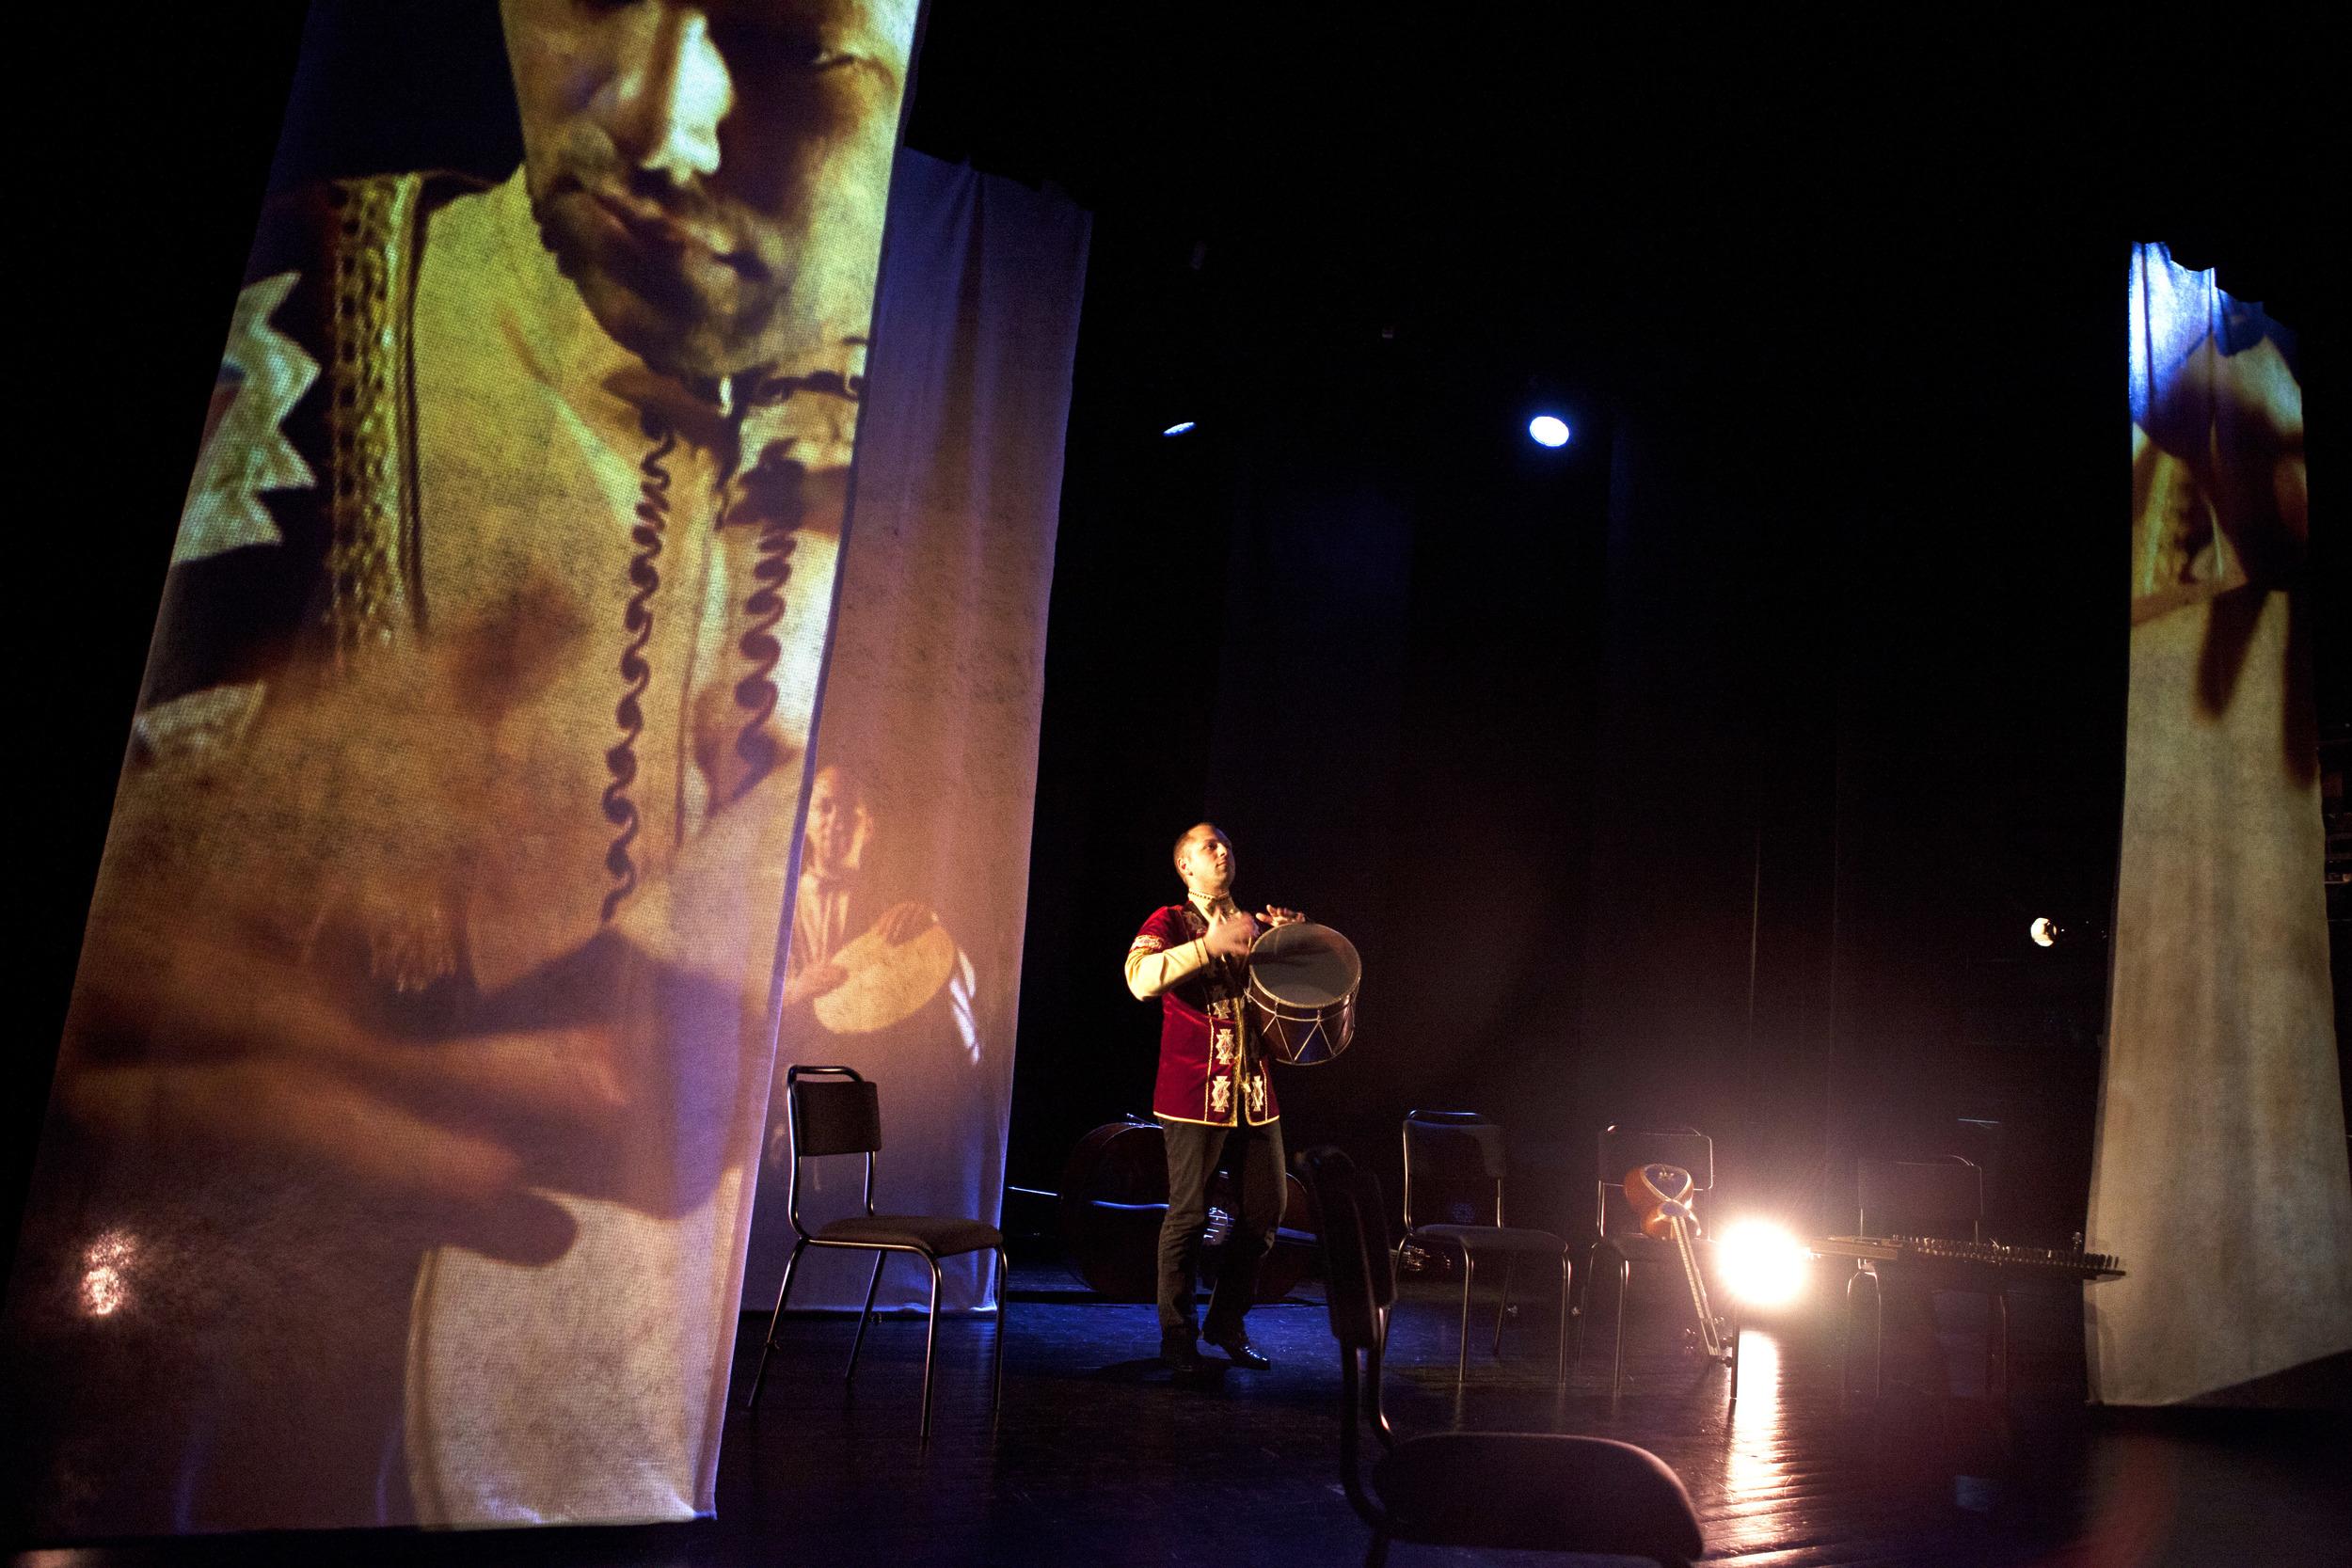 talent - teatersalen - 4. juli - heidi hattestein - IMG_5393.jpg